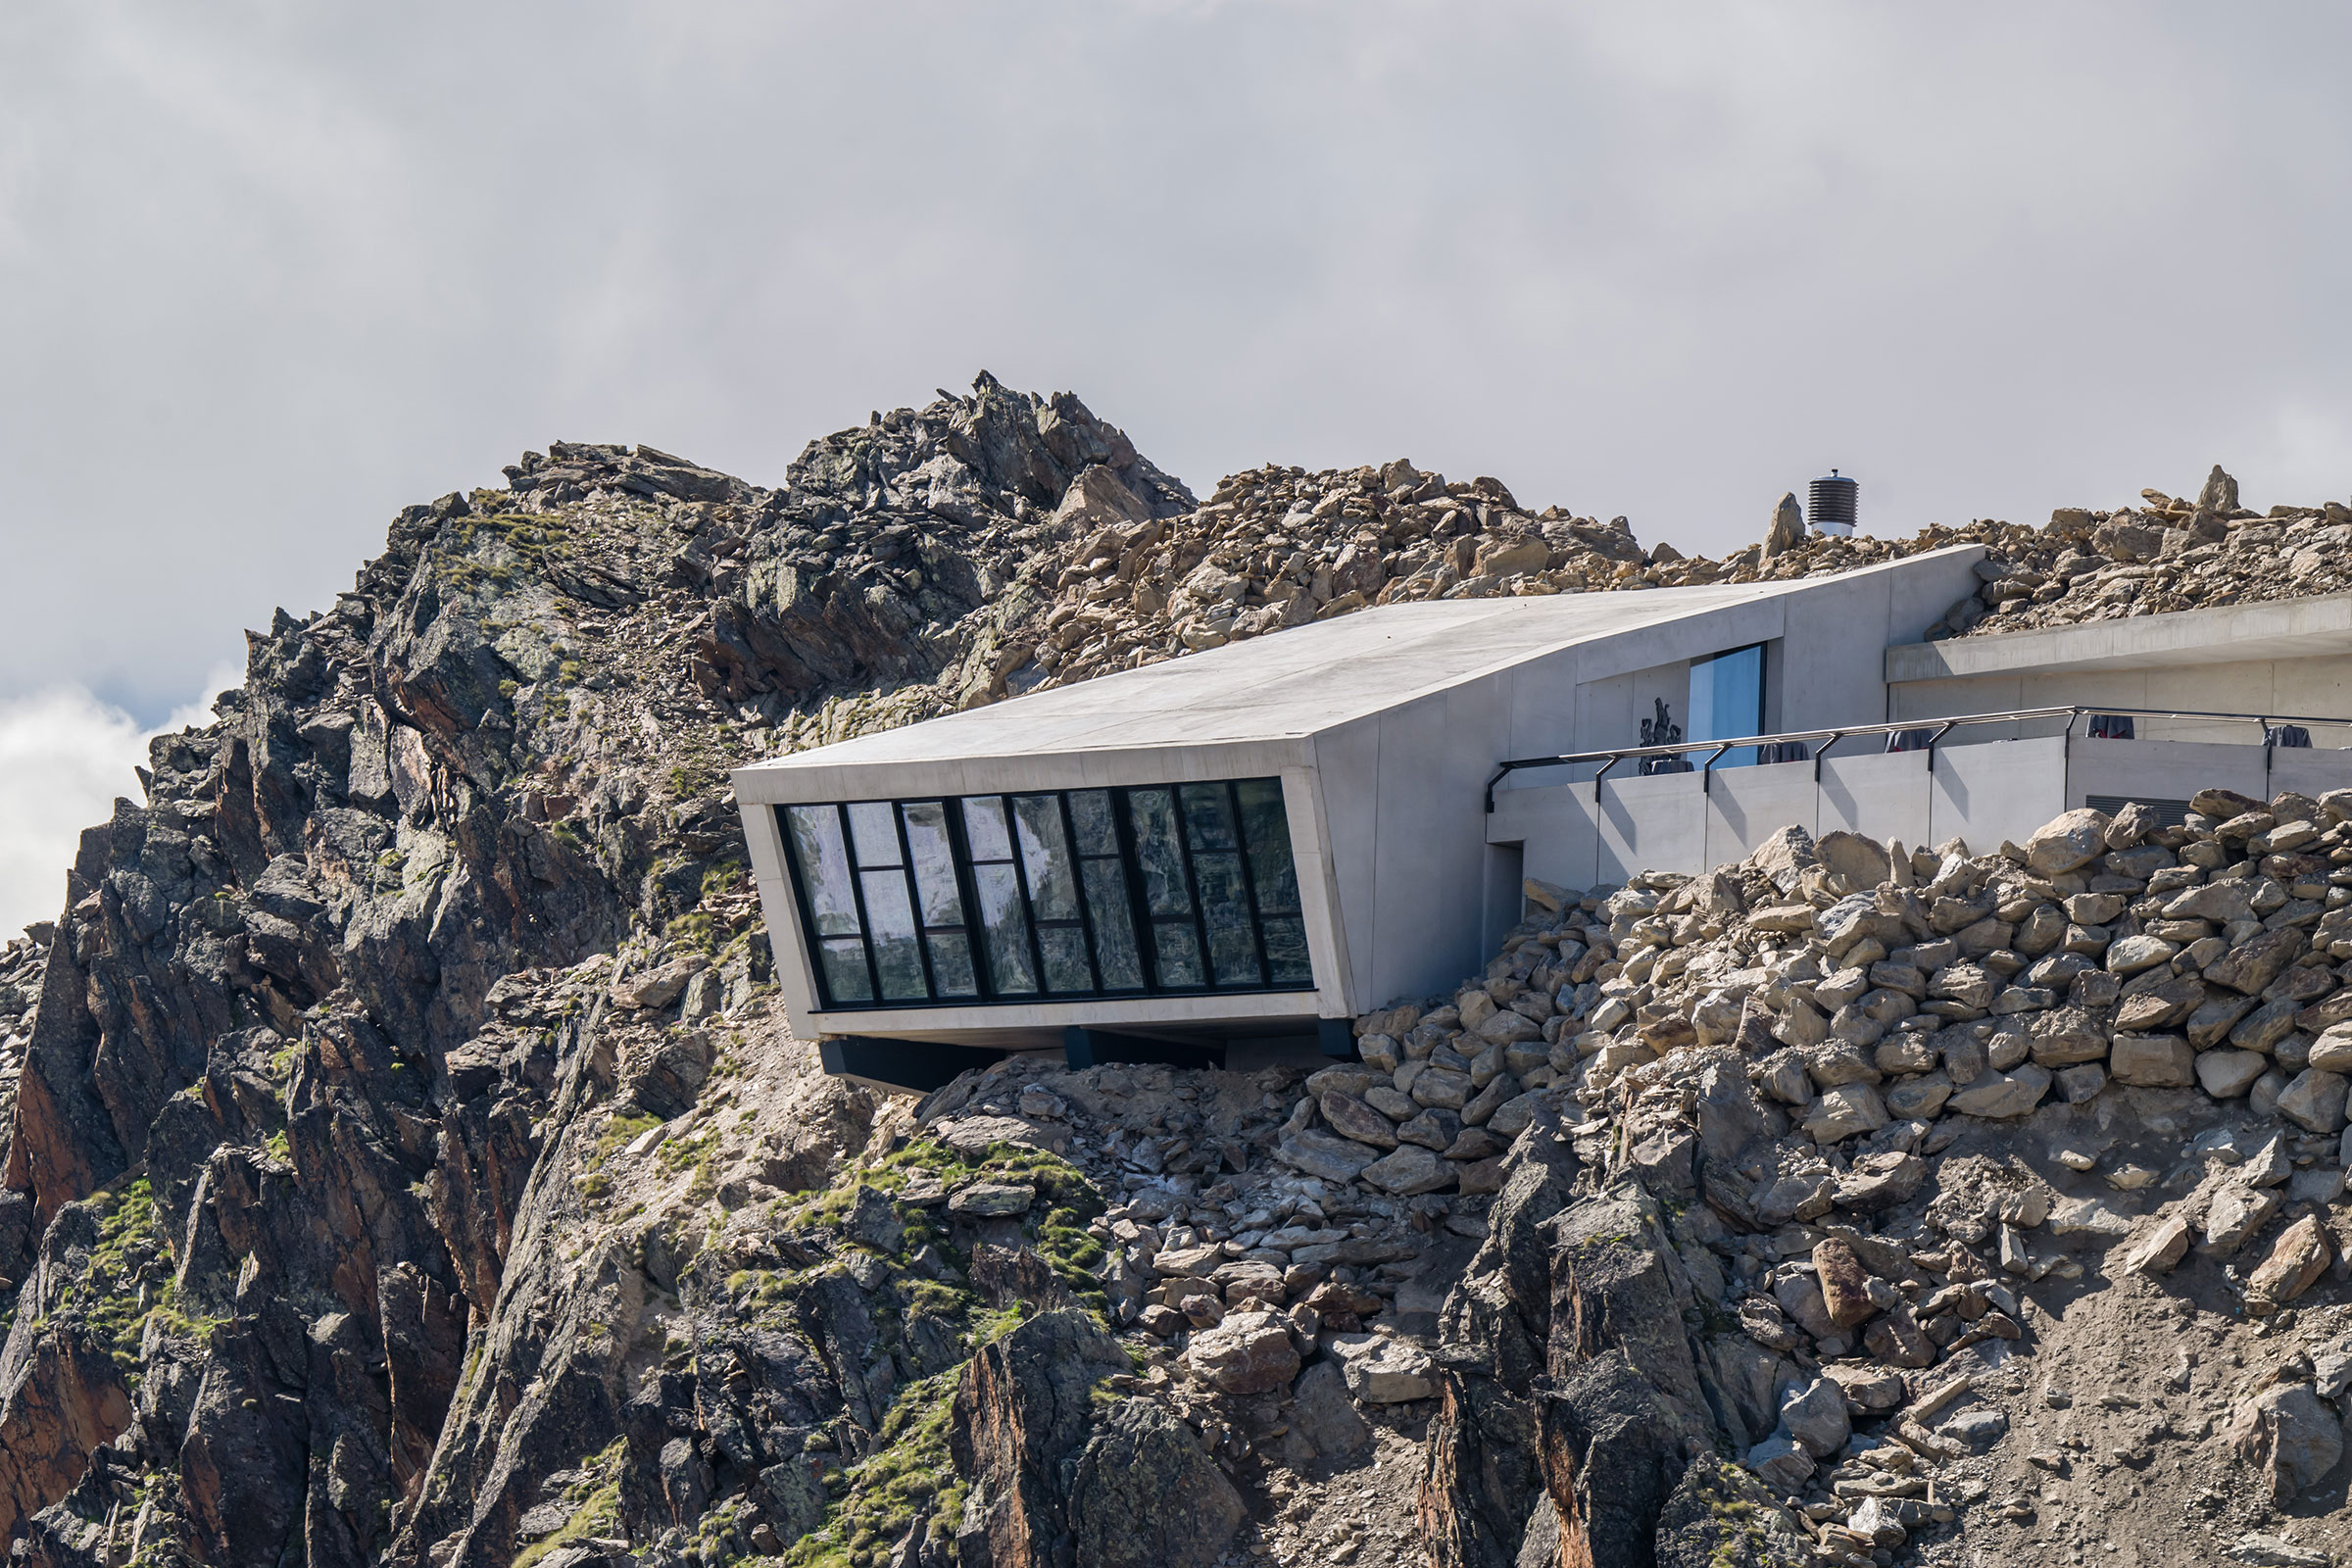 007 ELEMENTS in Sölden - Schlechtwetter-Tipps Ötztal